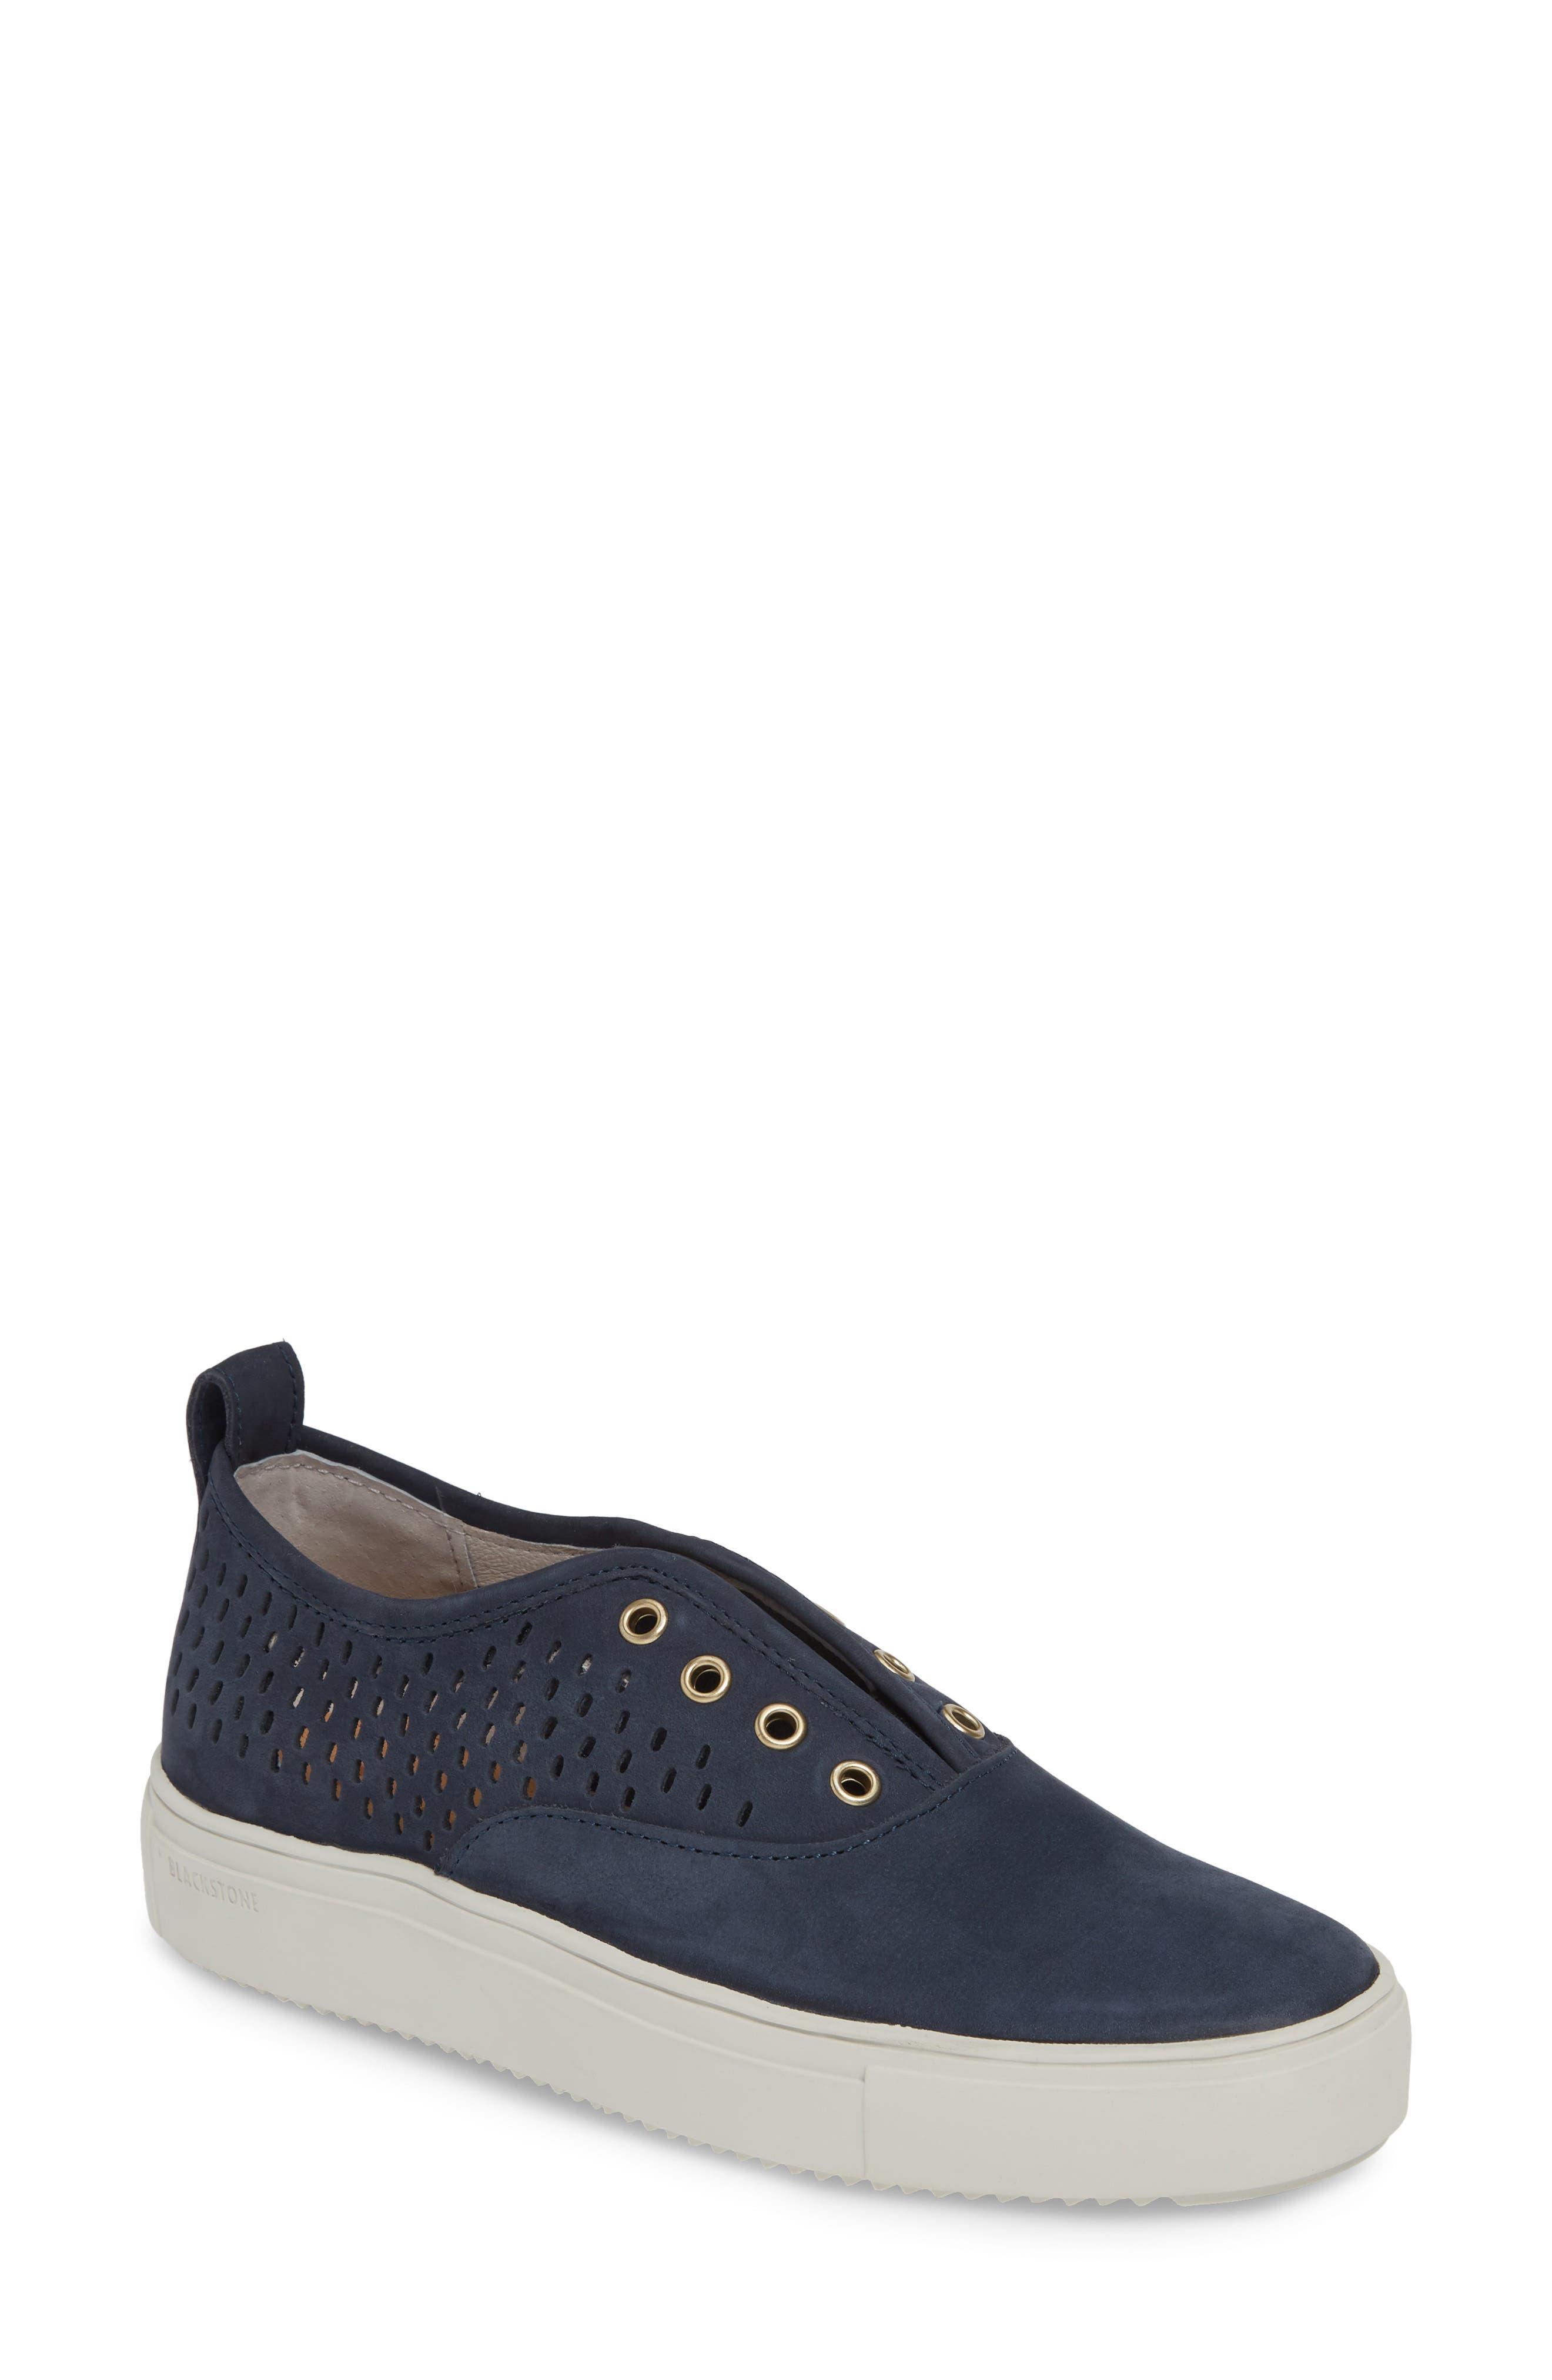 Blackstone Rl67 Laceless Perforated Sneaker, Blue